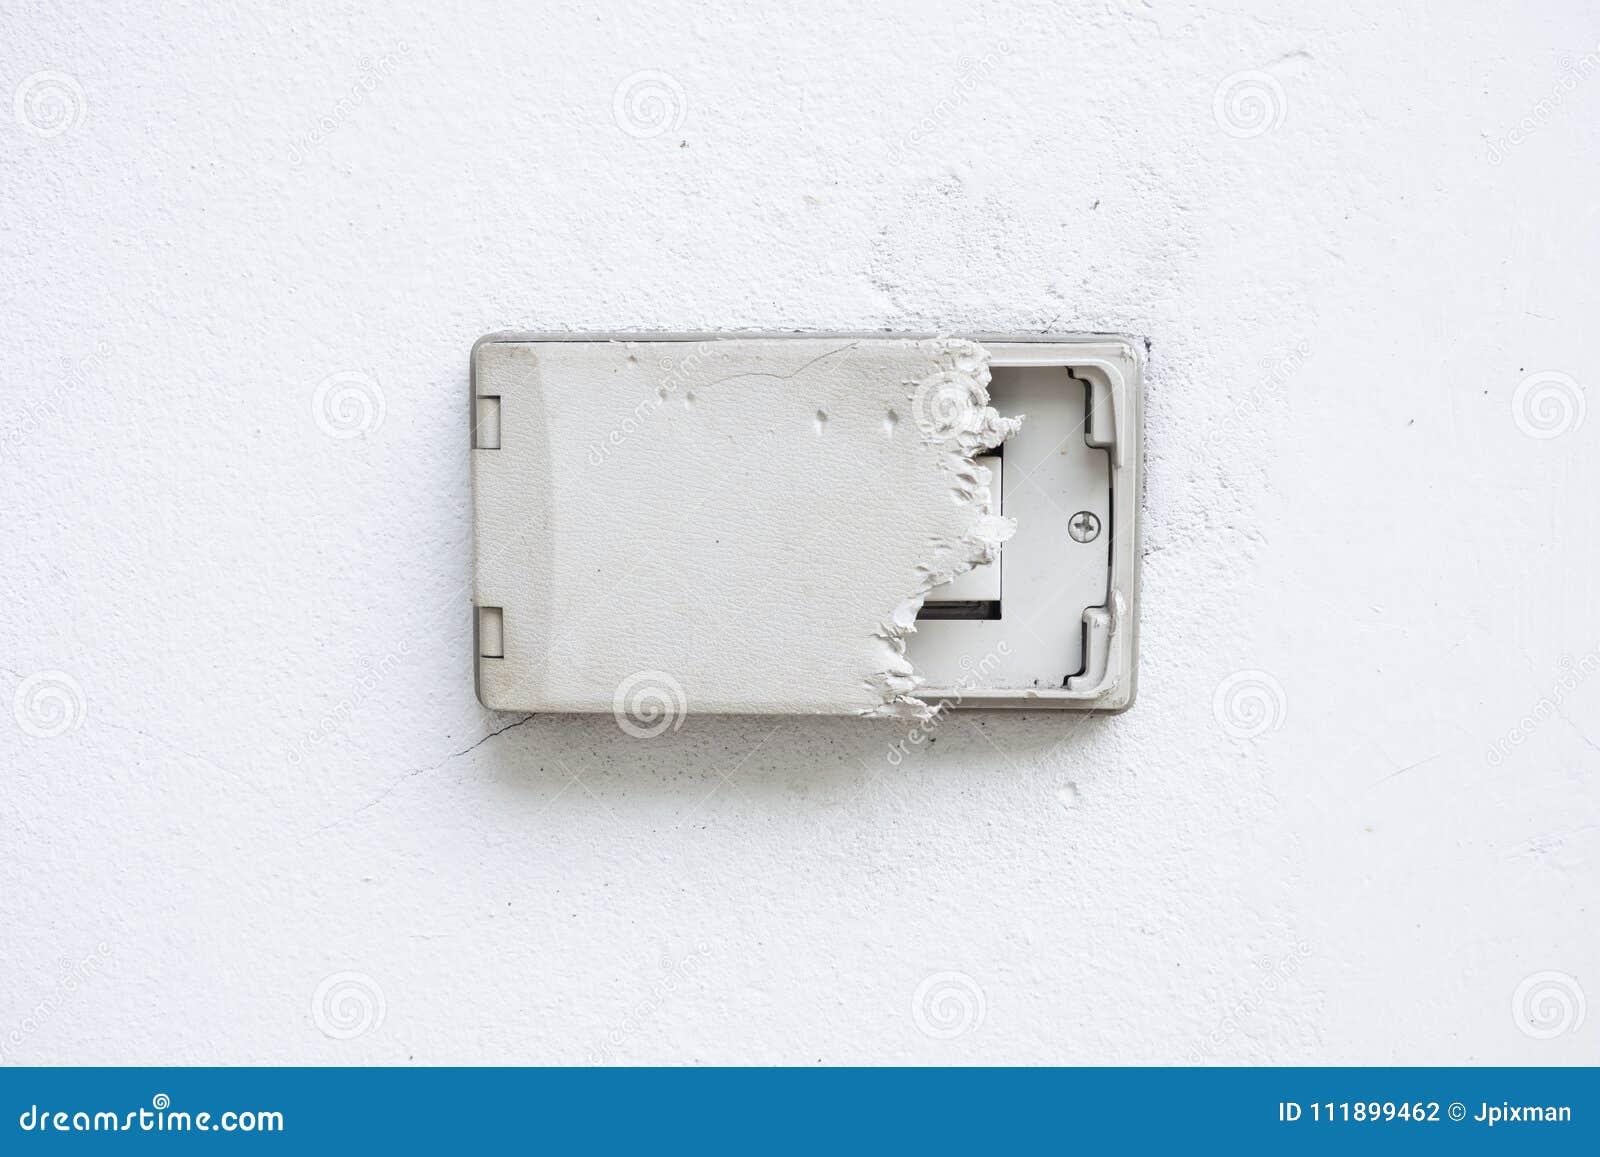 Electric Plug Cover Was Dog Bite. Wall Cover Plug Socket Damage ...